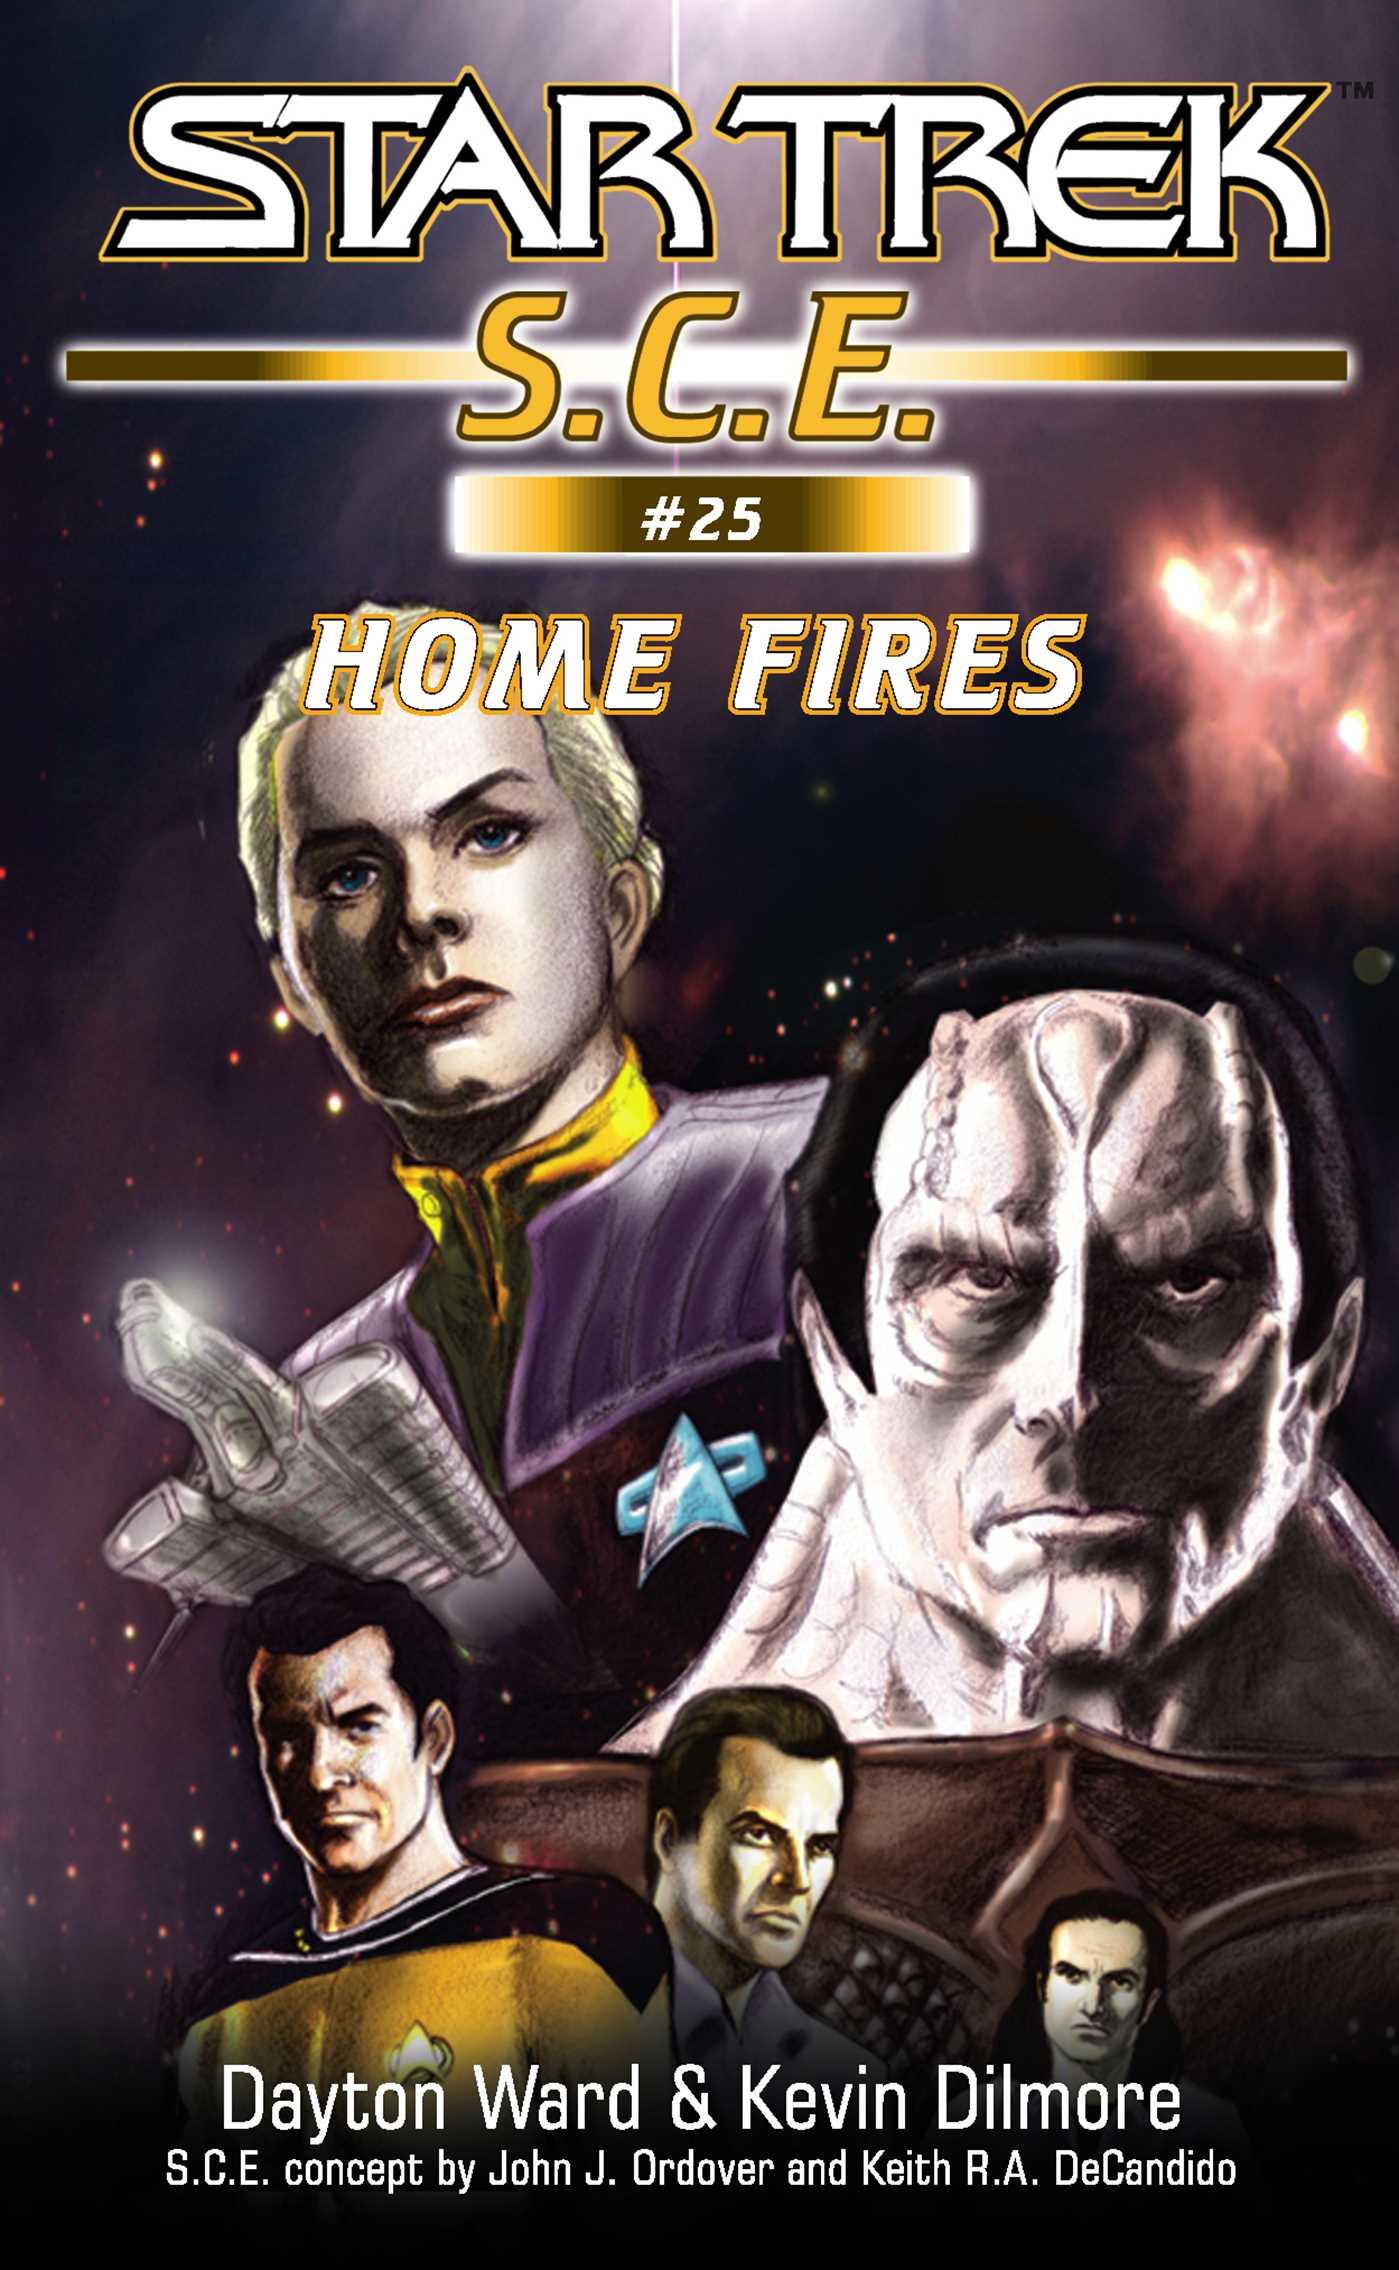 Star trek home fires 9780743475914 hr